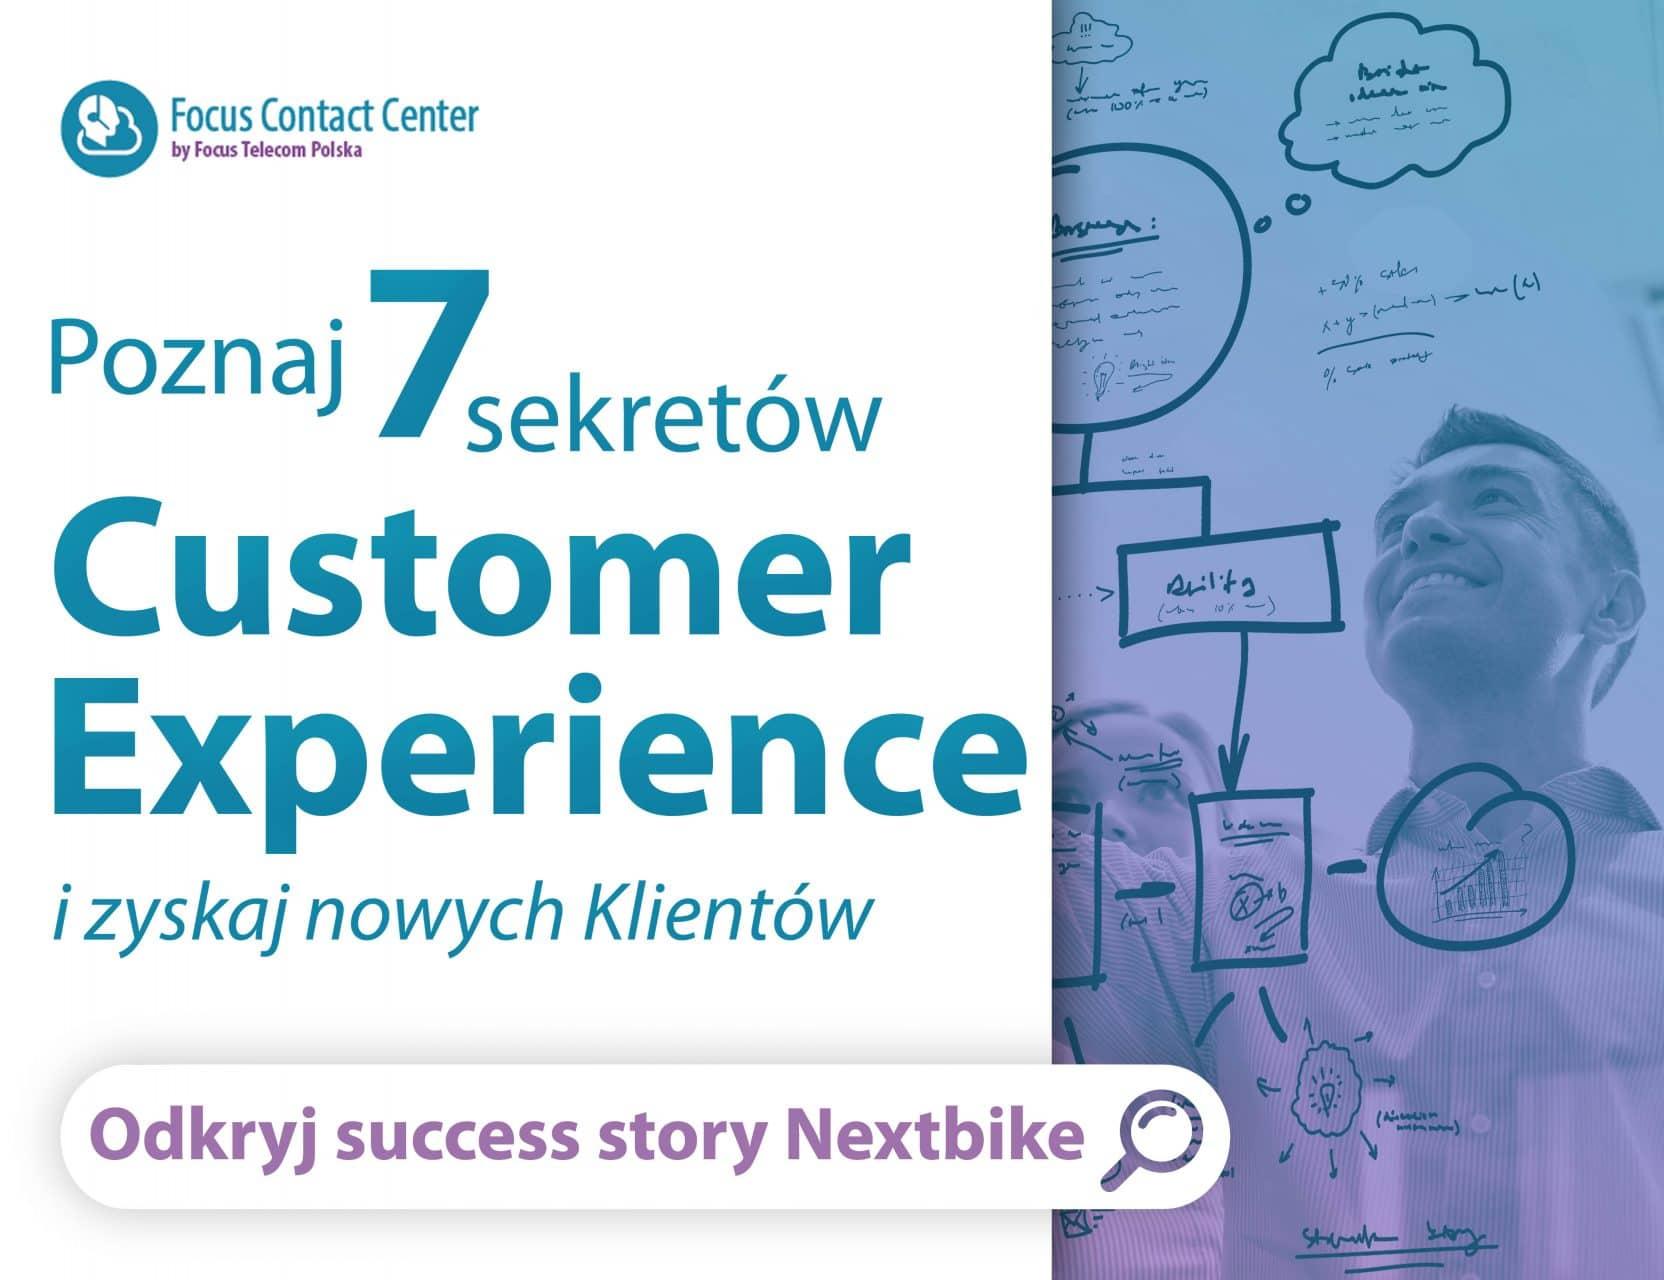 Case study biuro obsługi klienta - ebook customer experience